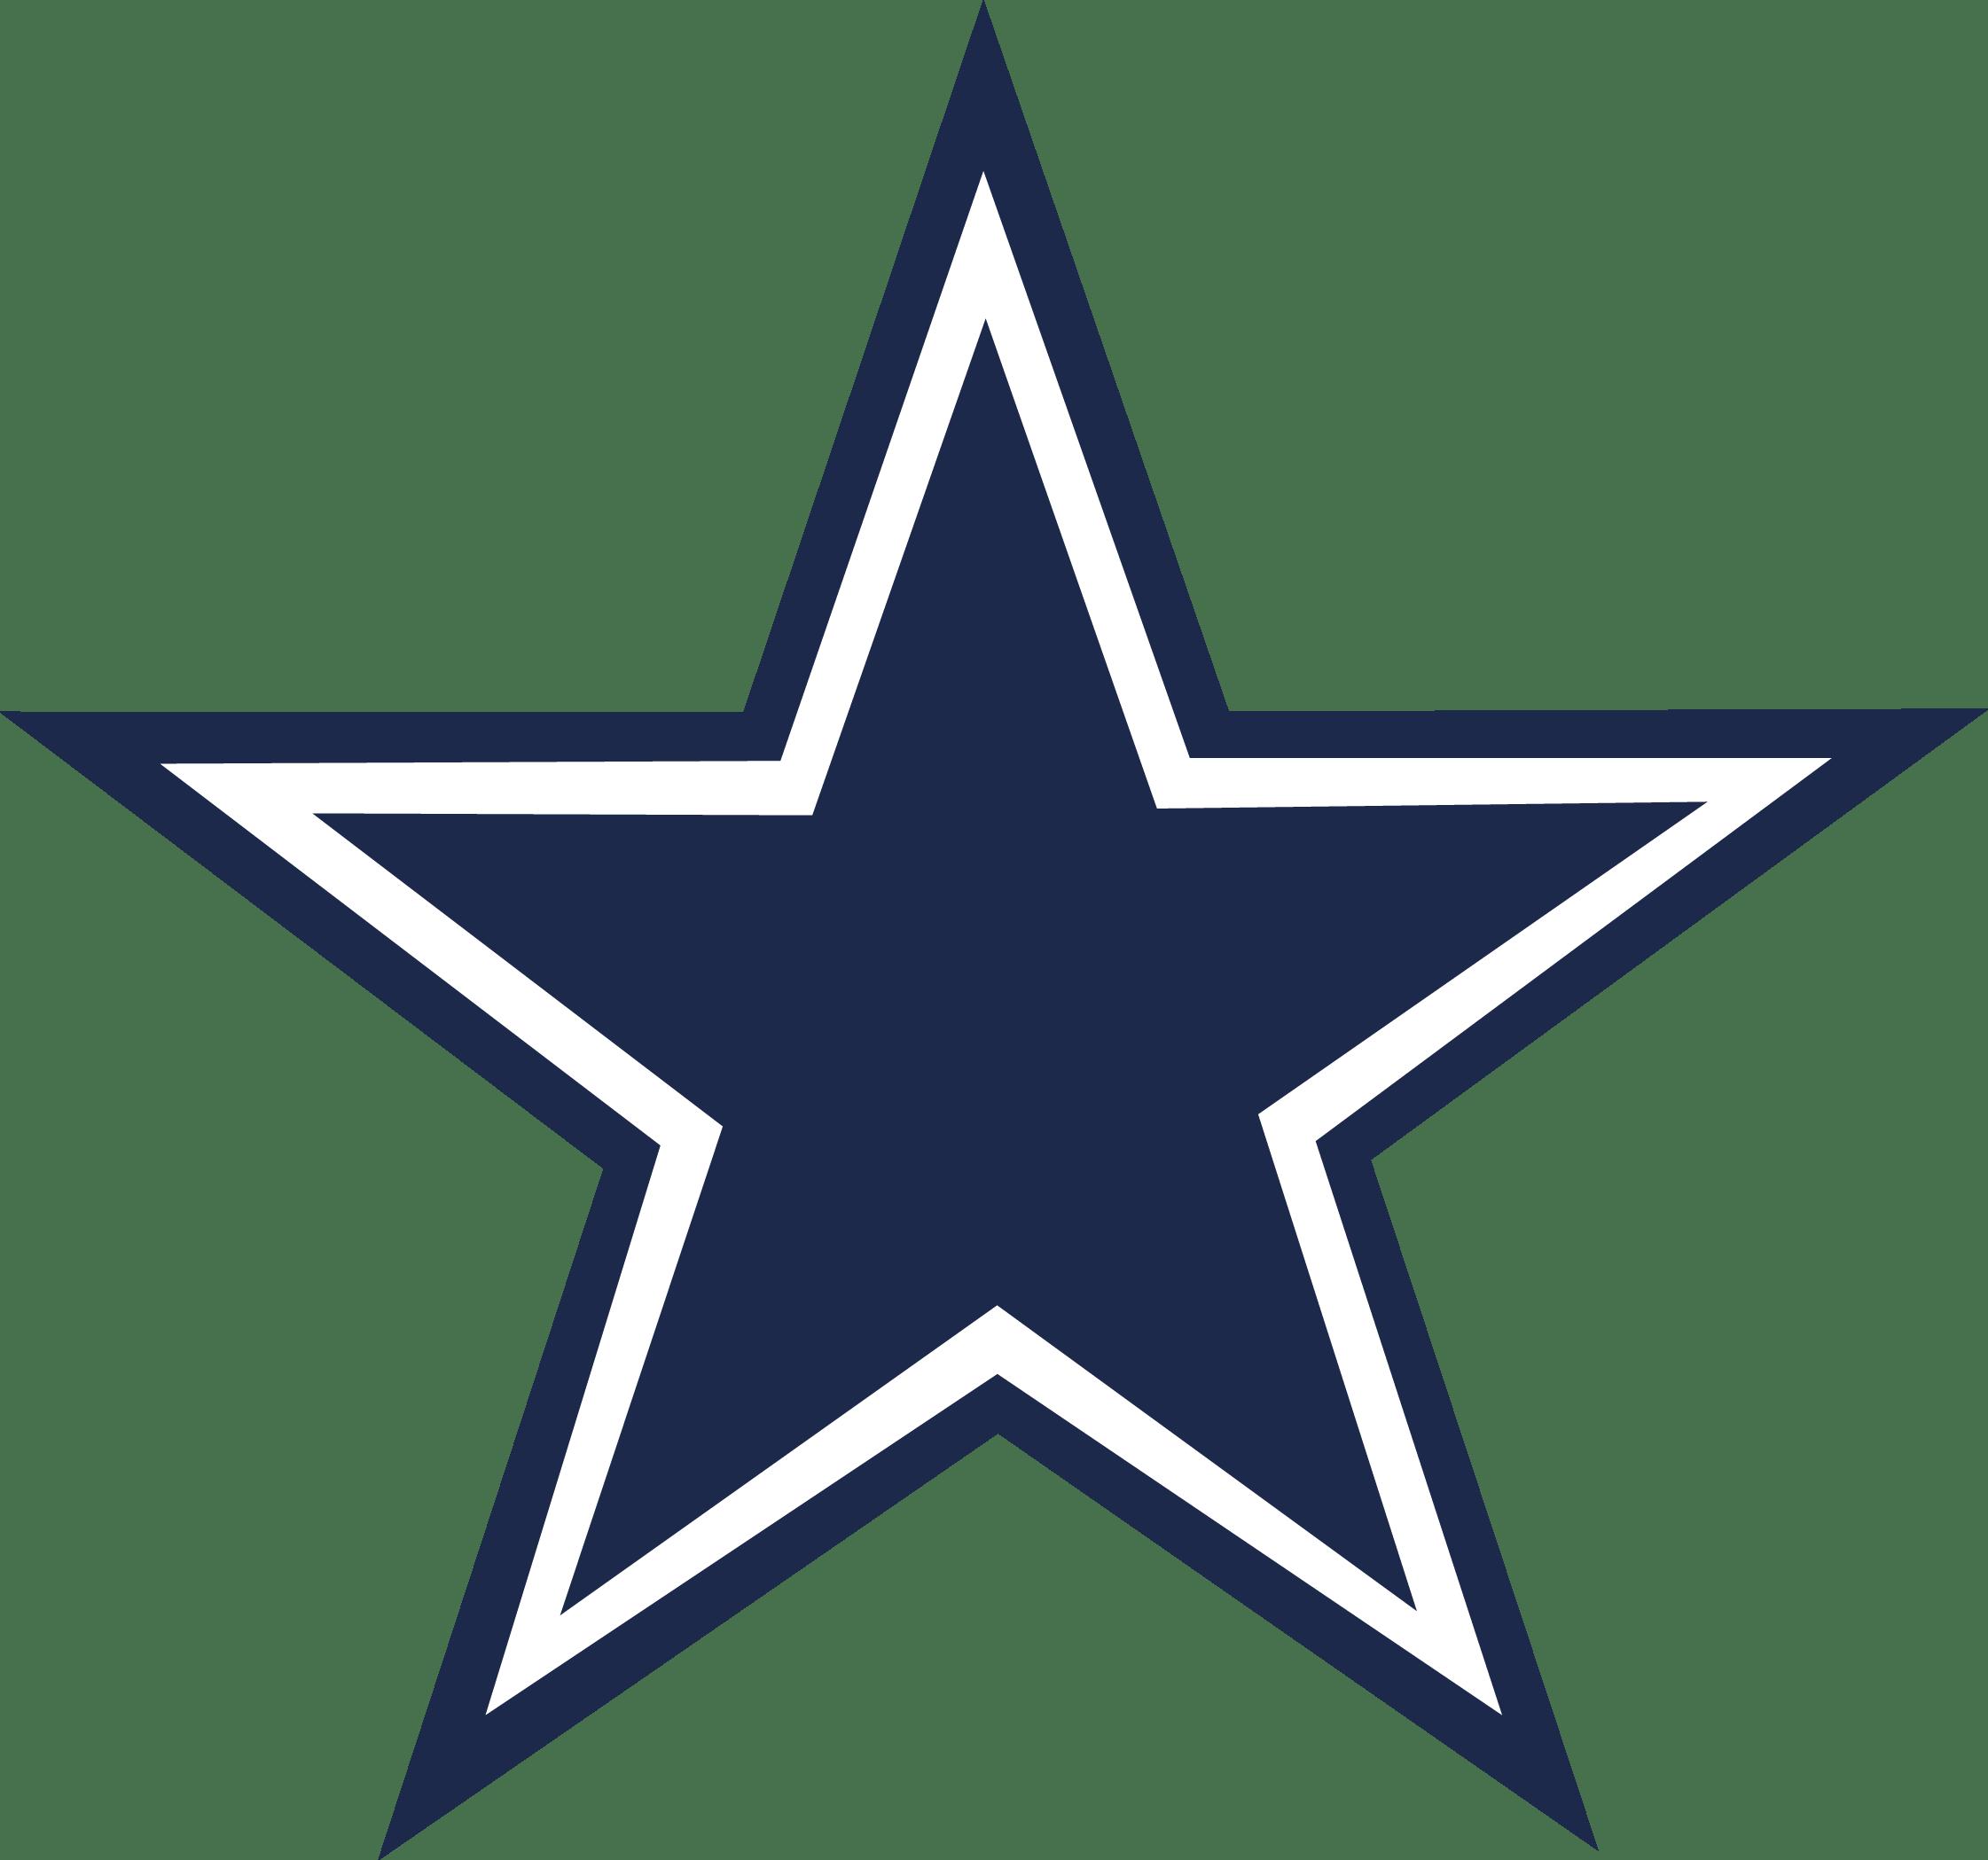 Dallas Cowboys Logo Vector EPS Free Download, Logo, Icons, Brand Emblems